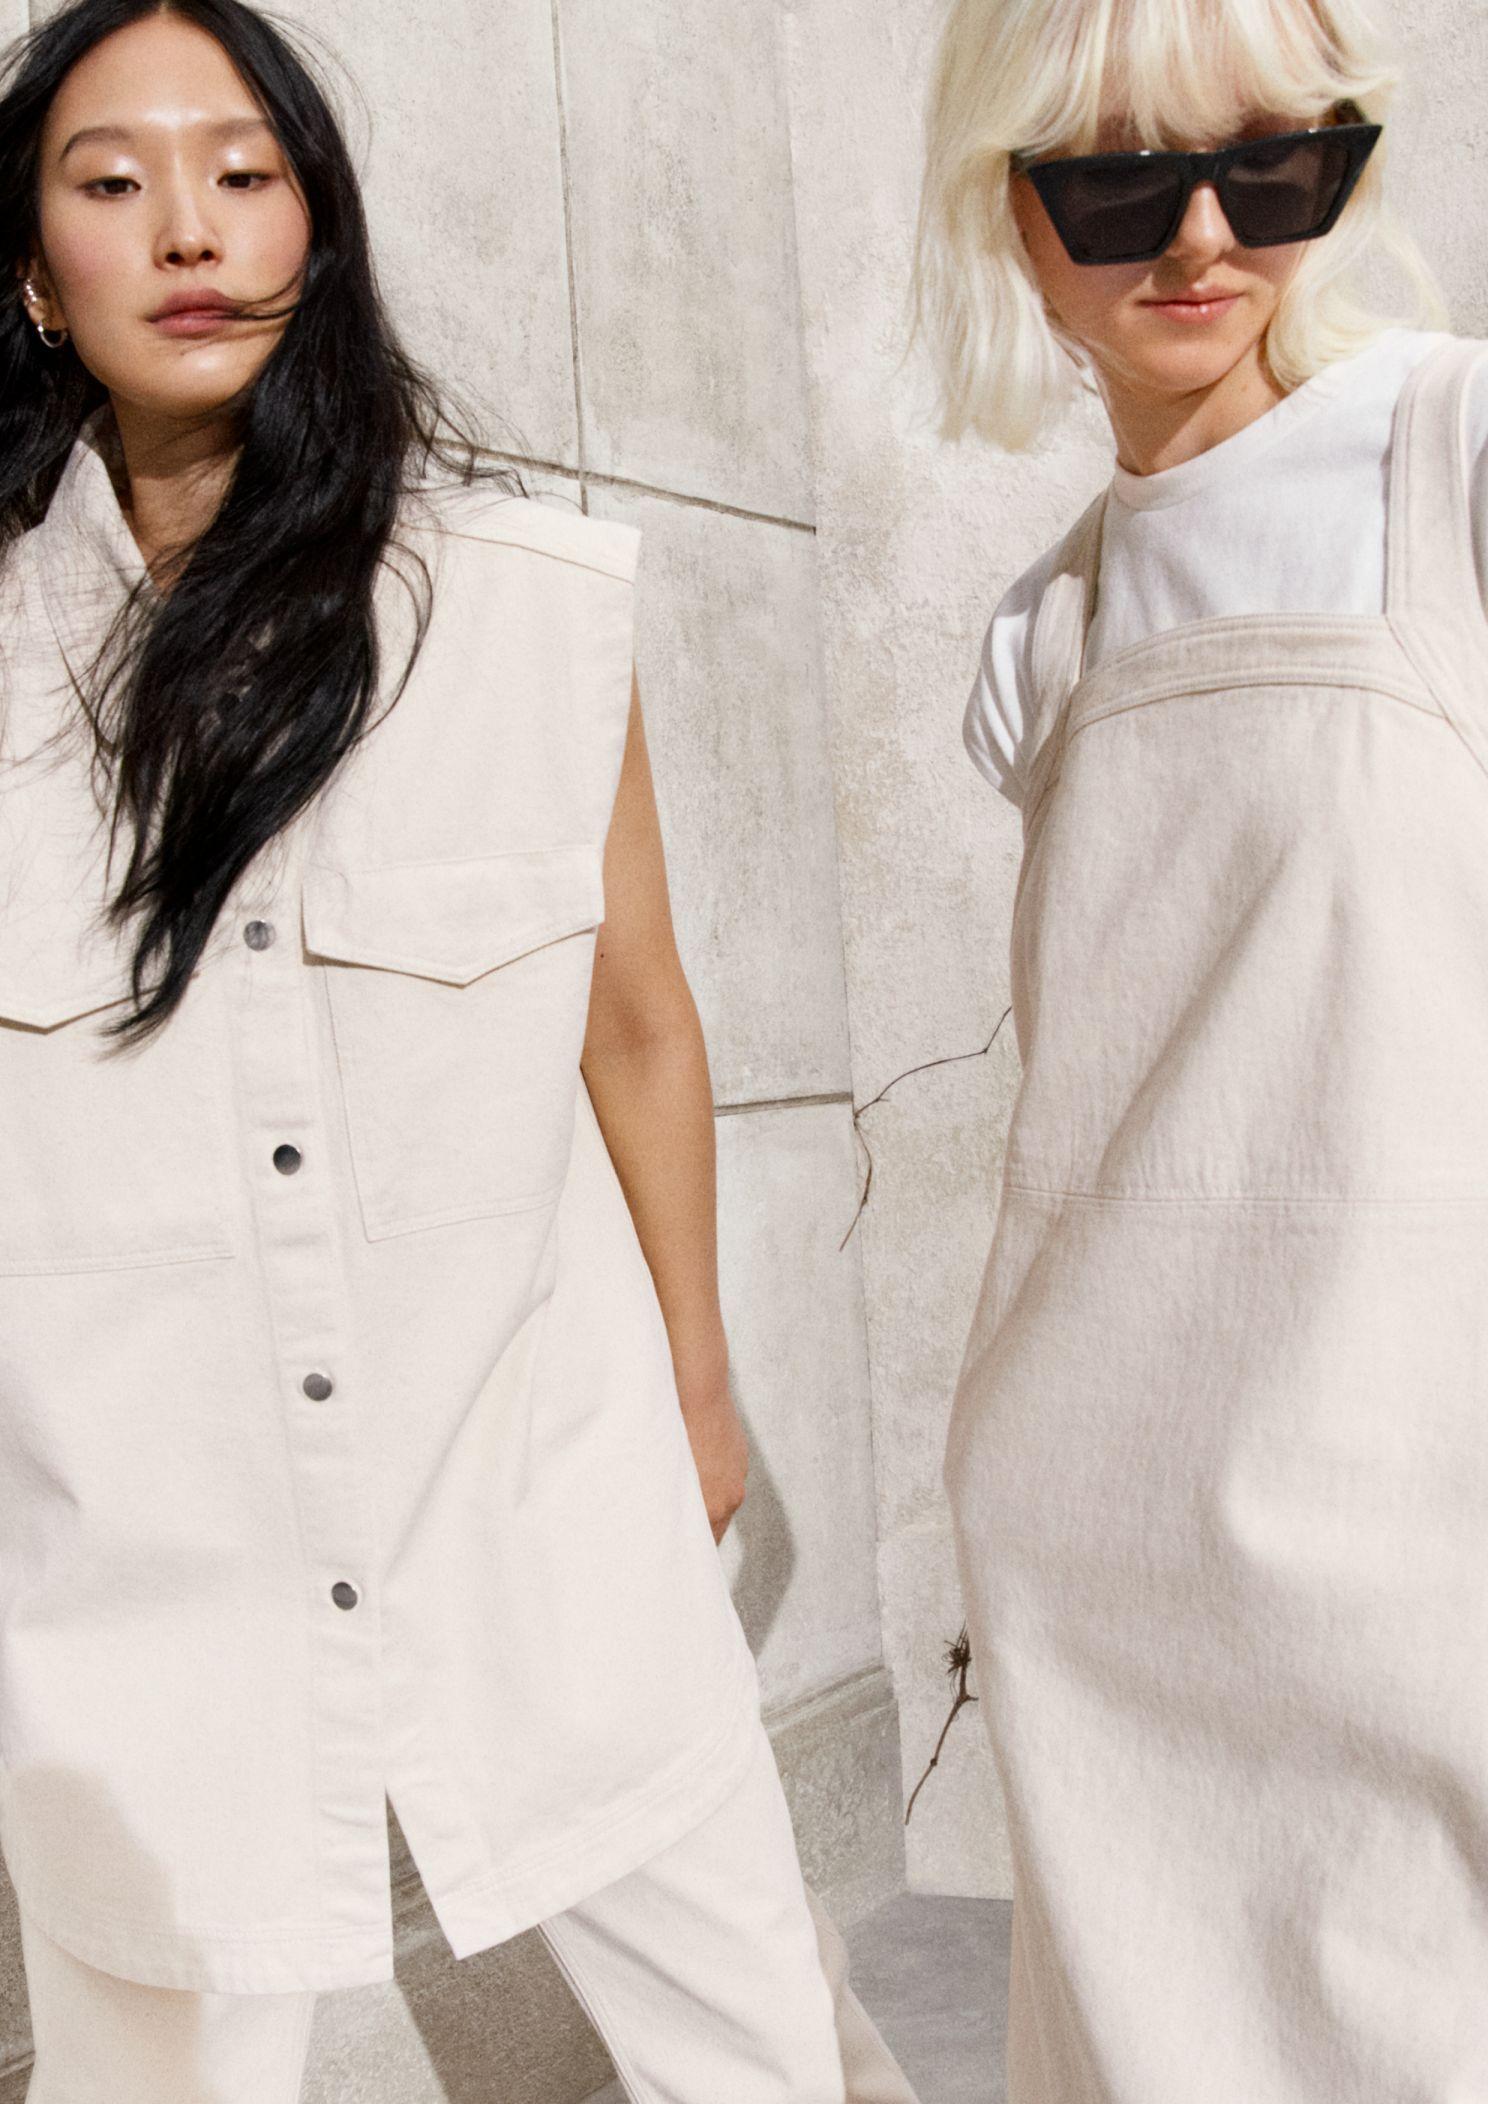 Die H&M Frühjahrskollektion 2021